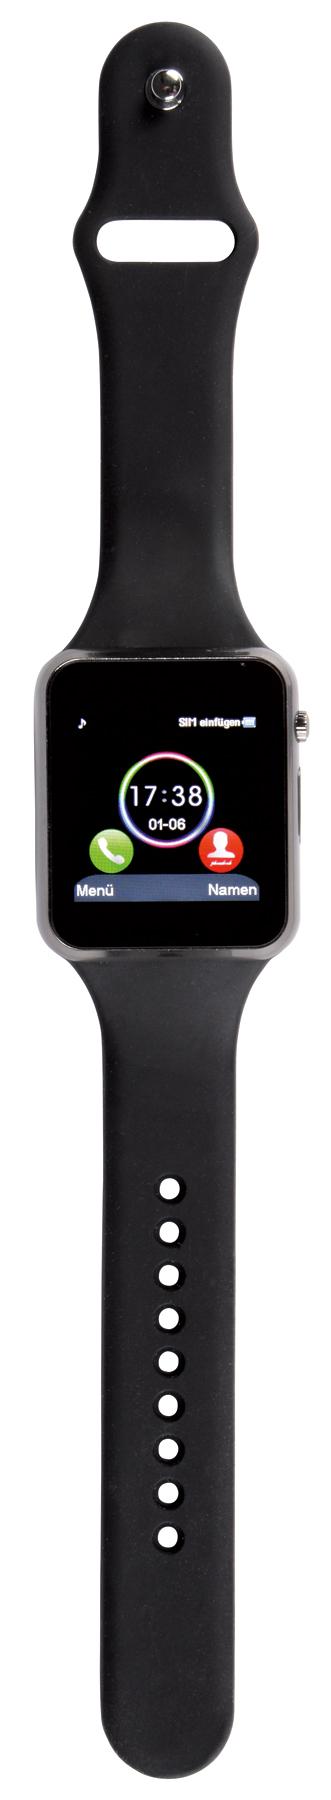 Smart watch CONNECT, czarny